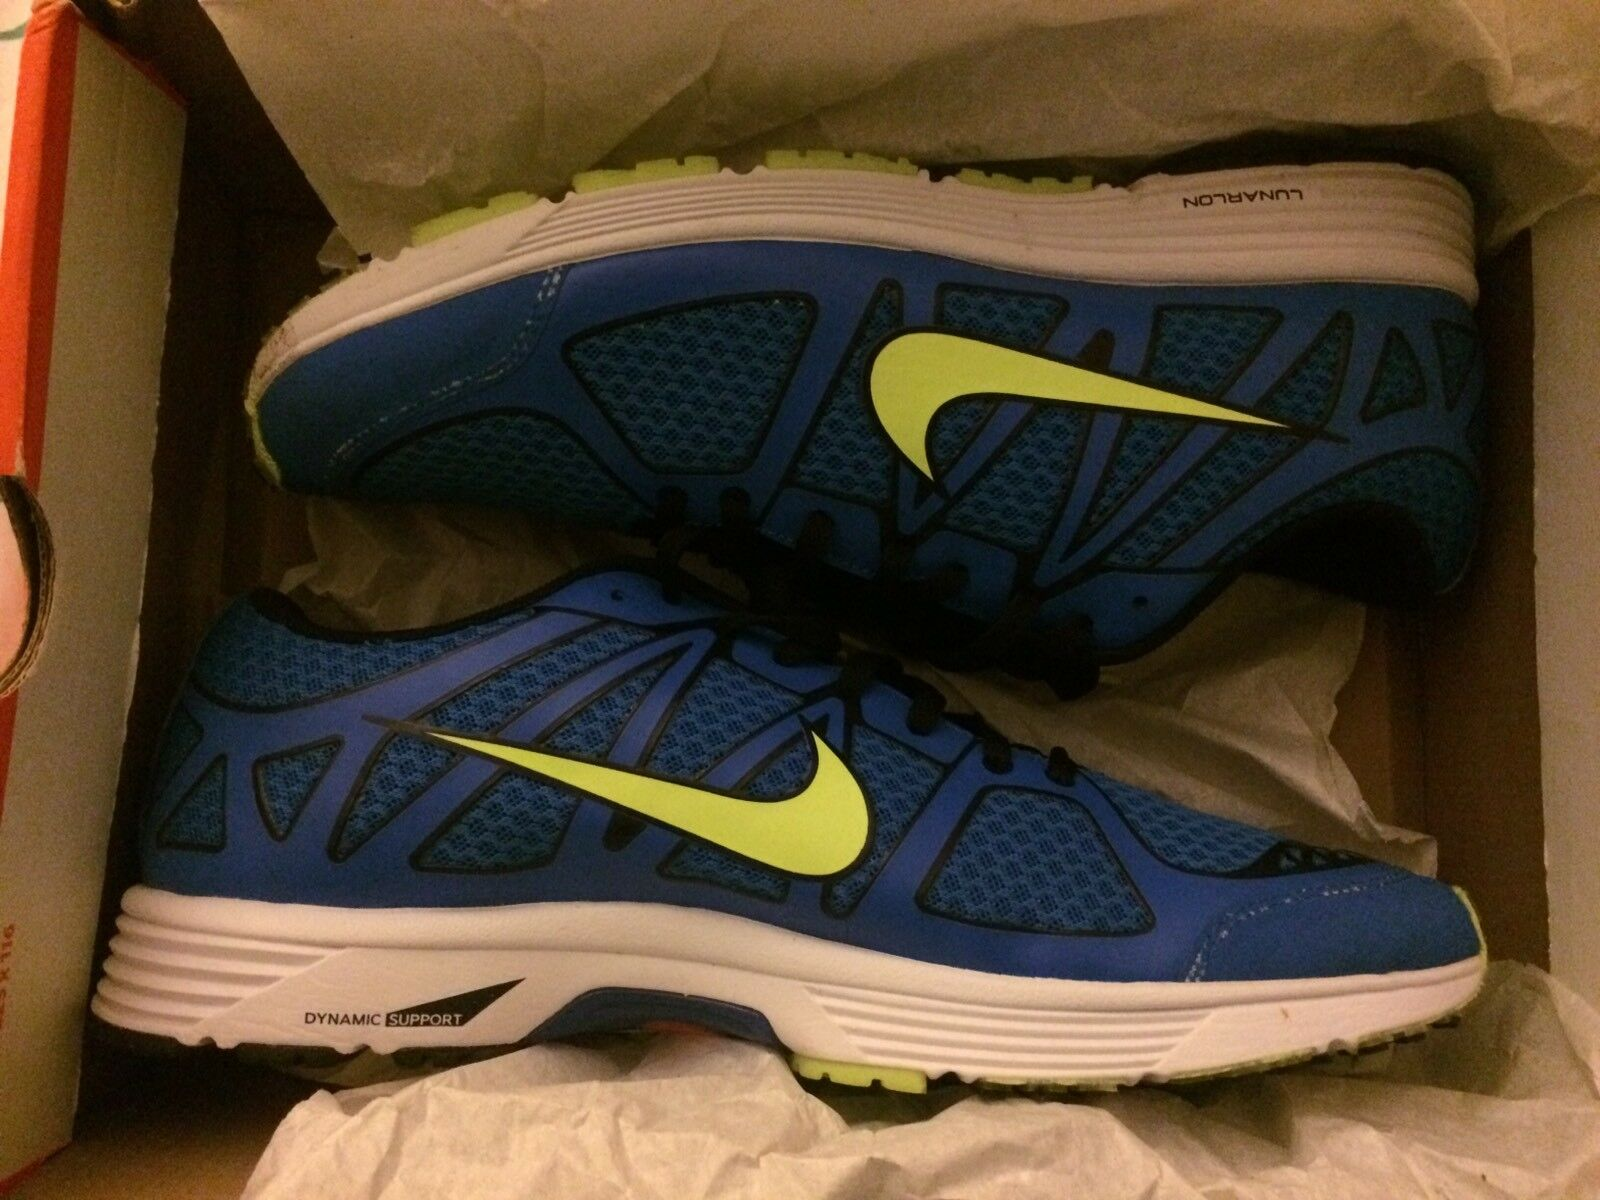 Nike Lunarapeed Lite+ Running XC Triathlon 11 SOAR VOLT BLACK WHITE 487343 470